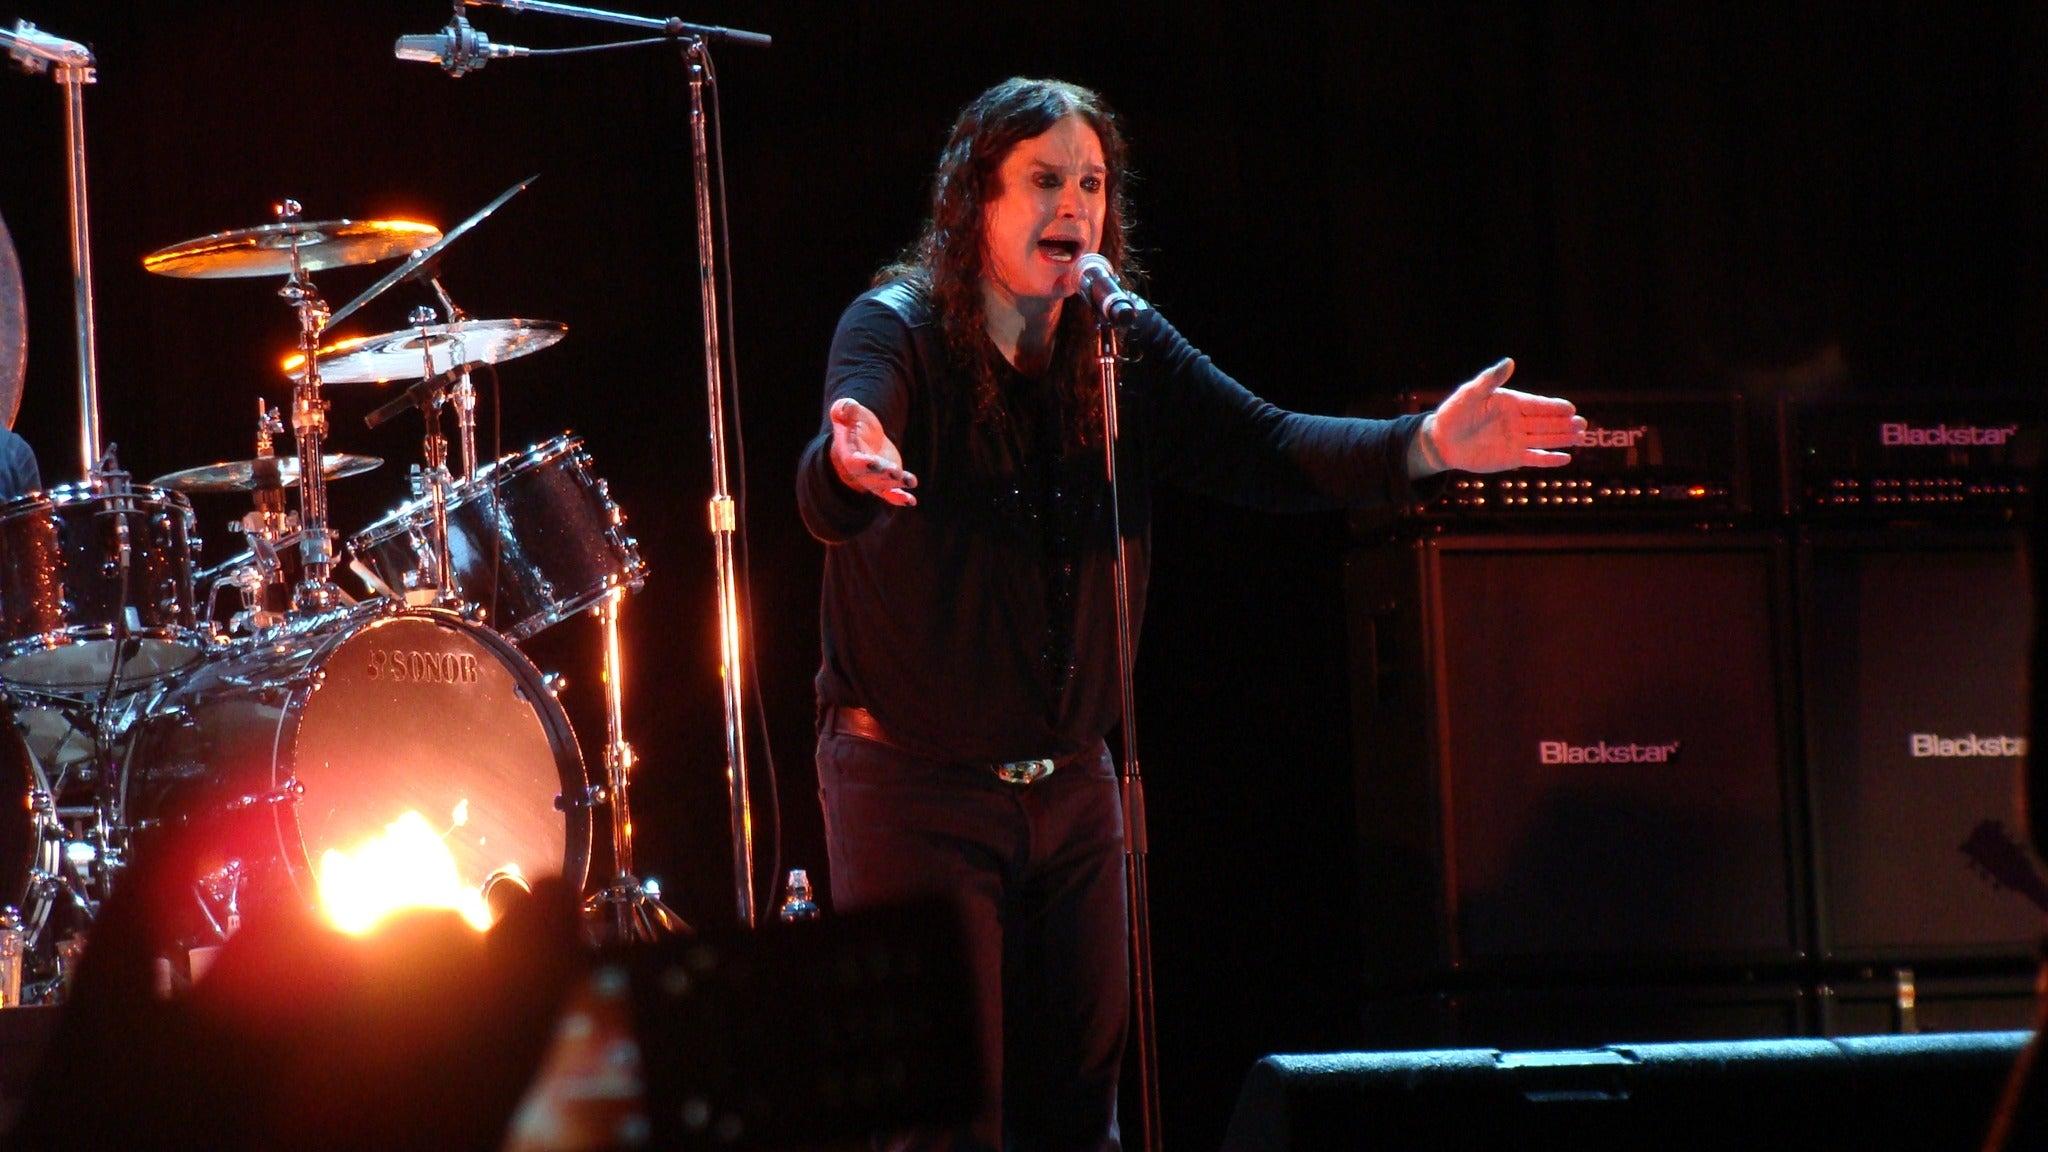 Ozzy Osbourne - Meet & Greet Packages